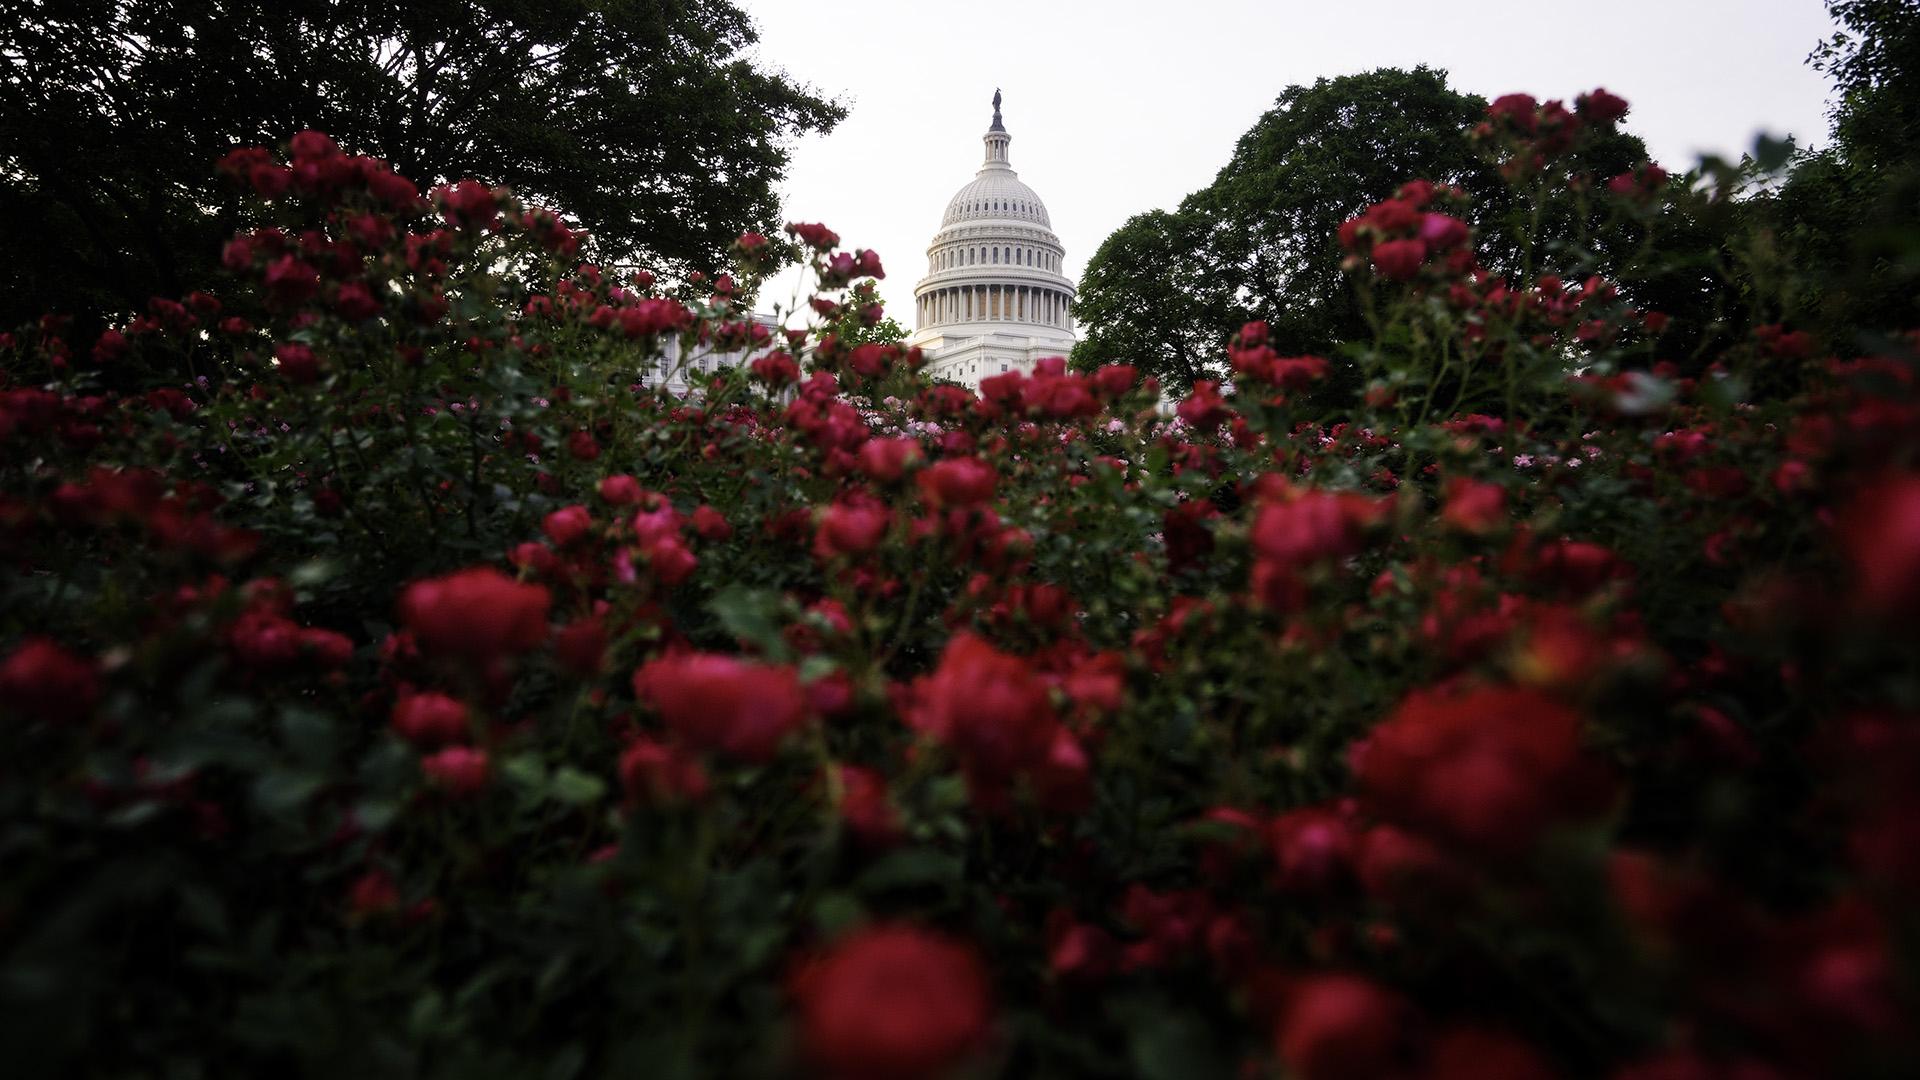 US_Capitol_Flowers_Zoom_Background_Angela B Pan